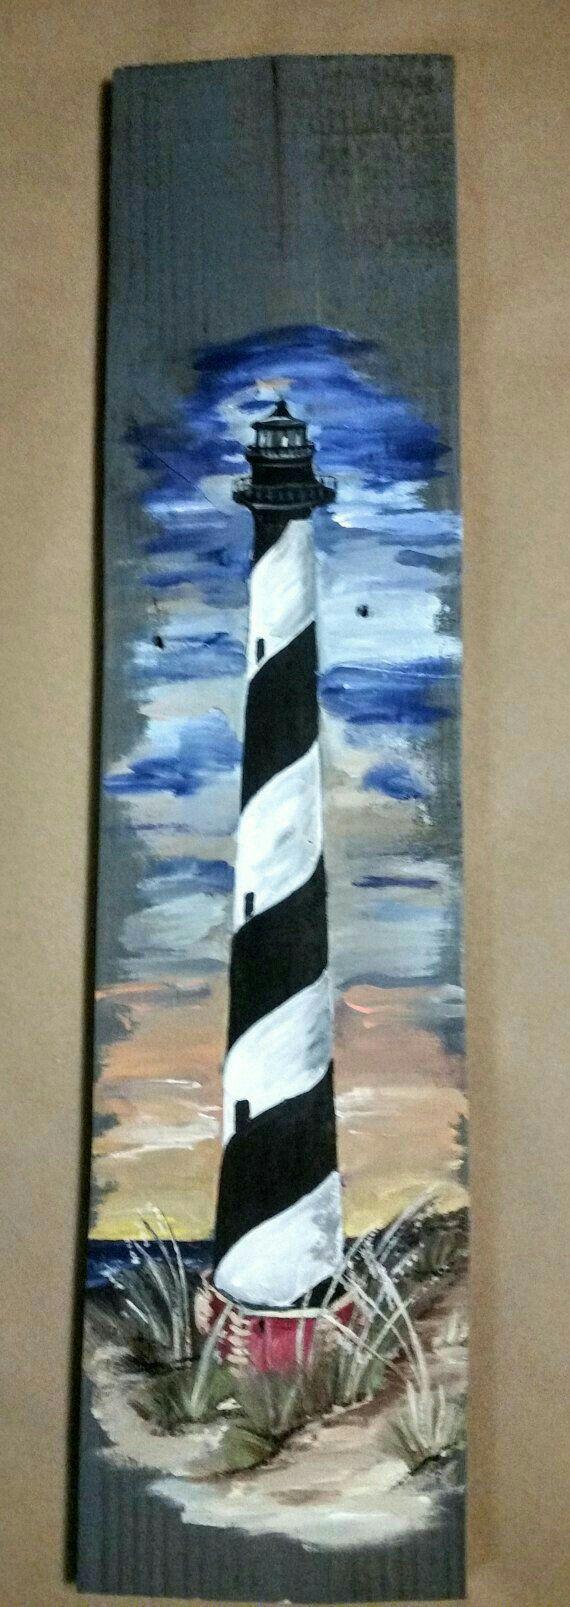 Lighthouse decor for bathroom - Painting For Mommom